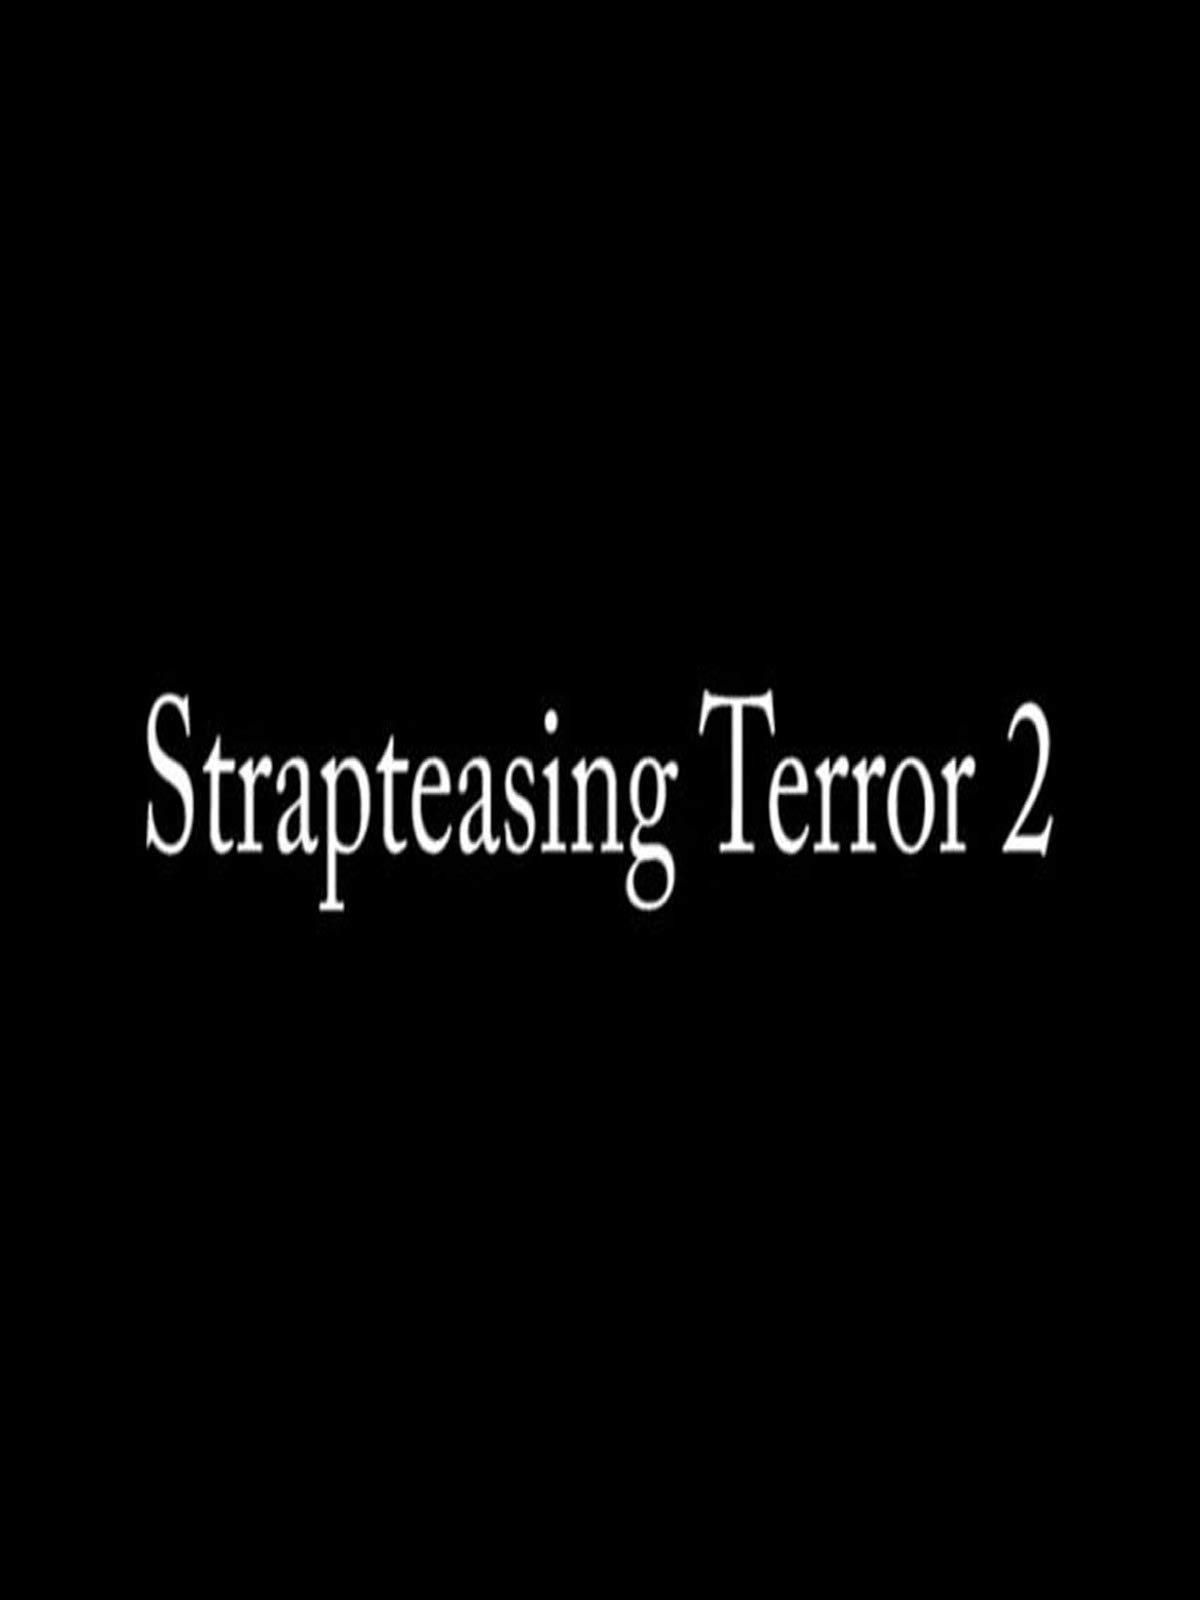 Strap Teasing Terror 2